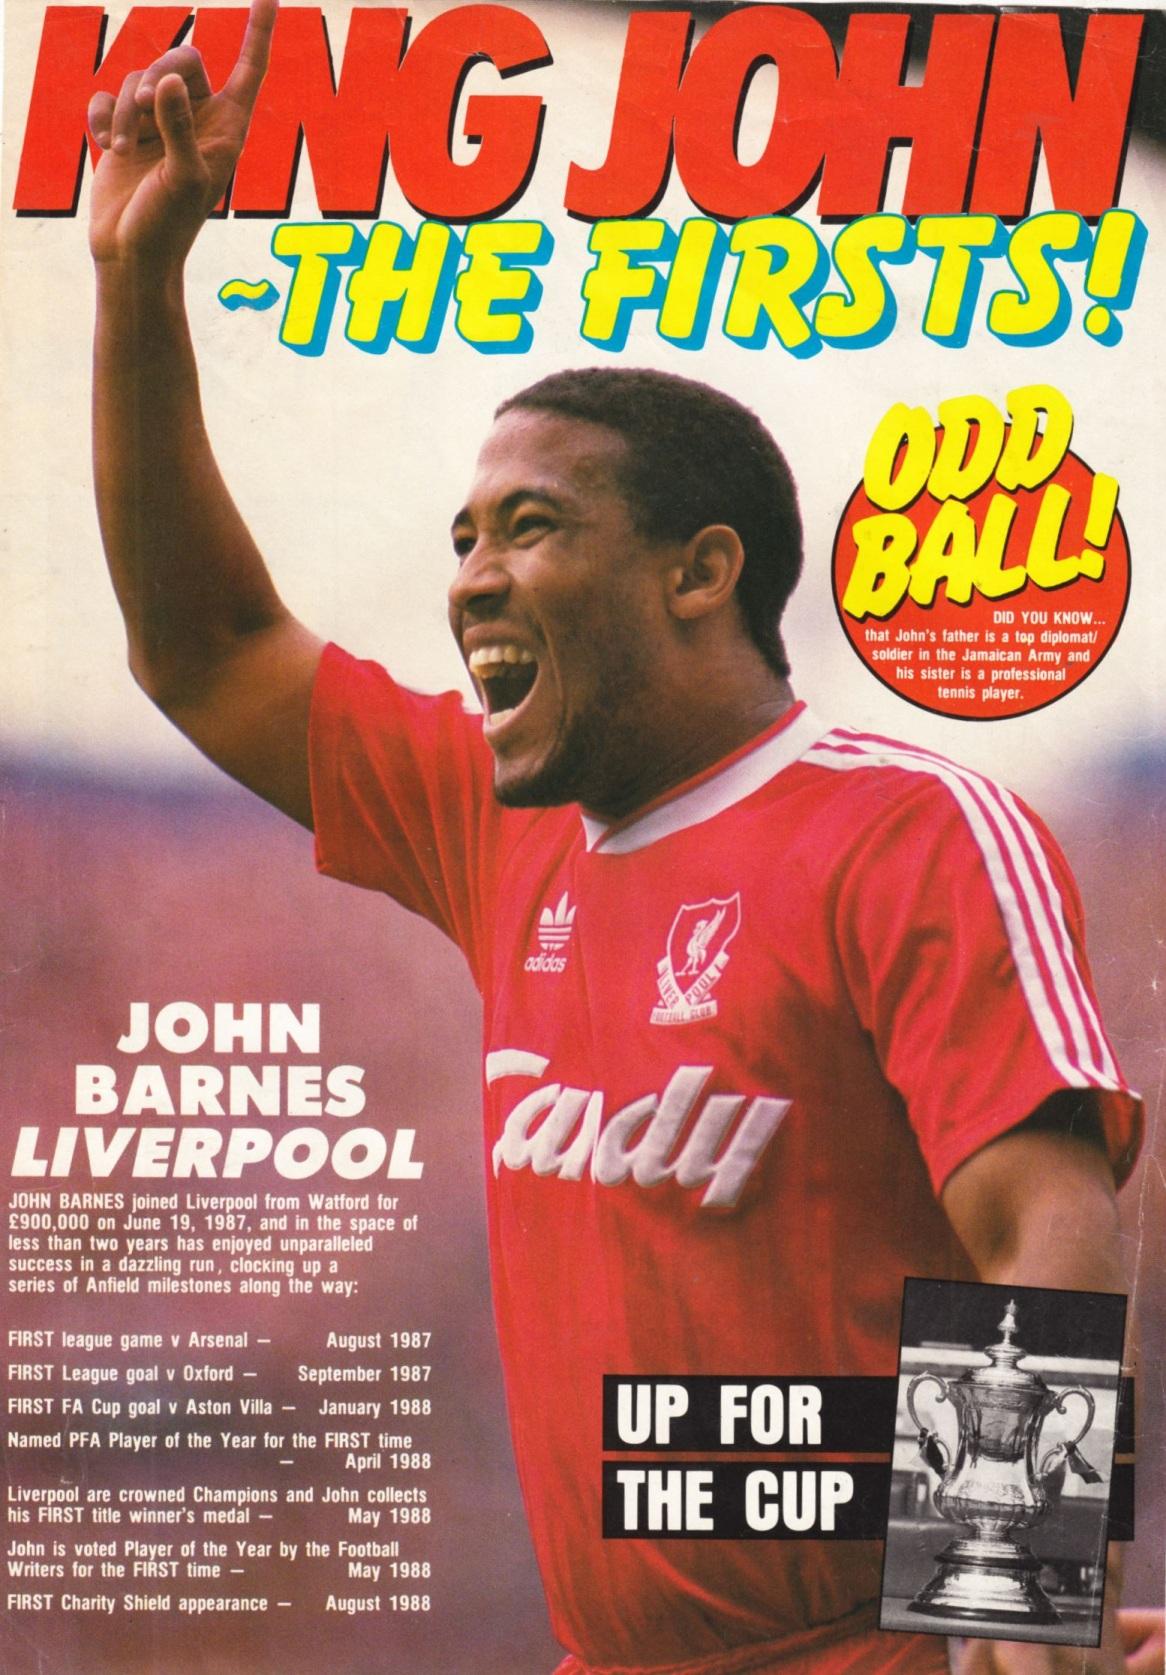 John -  LFChistory stats for Barnes Liverpool career